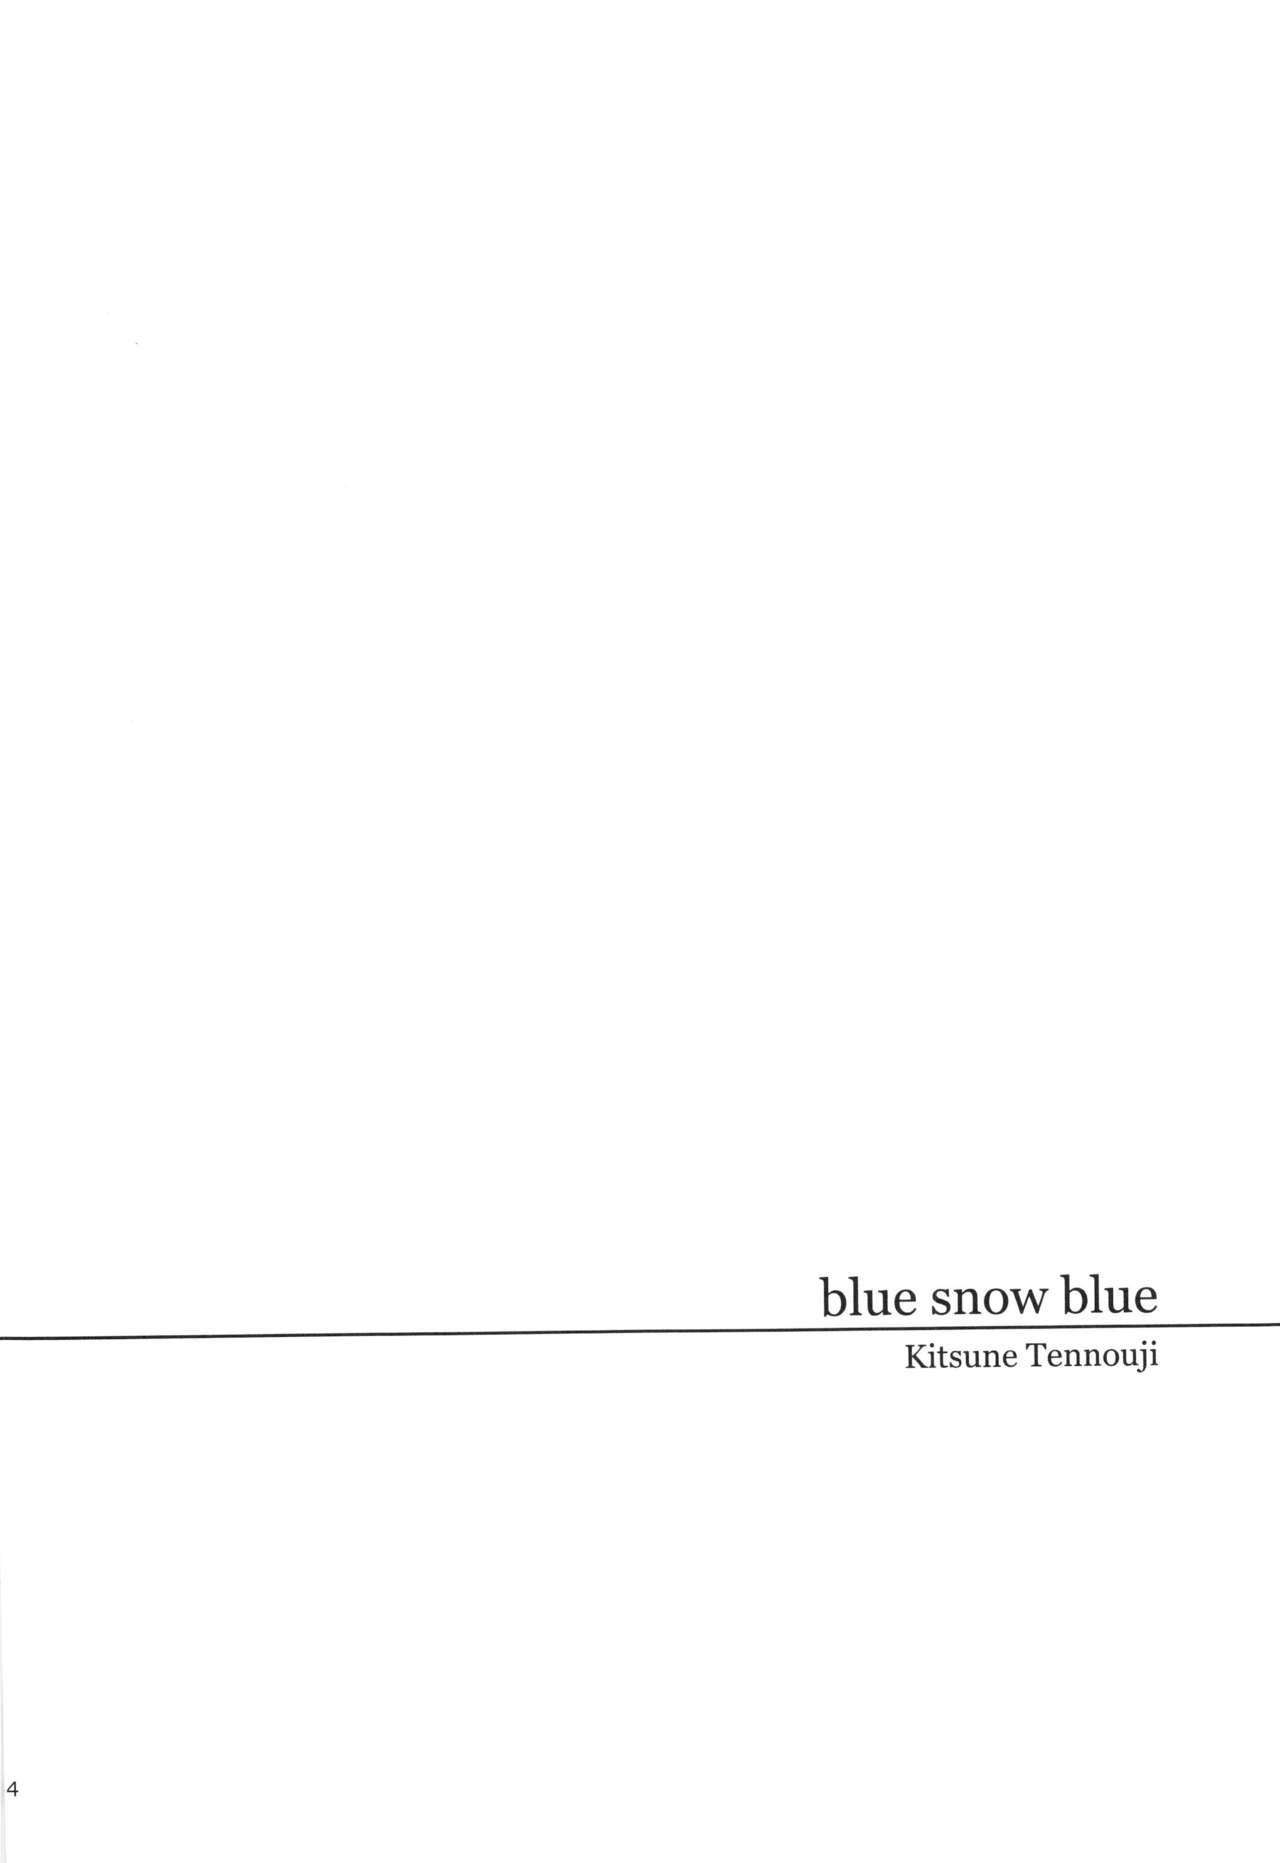 blue snow blue scene.15 3